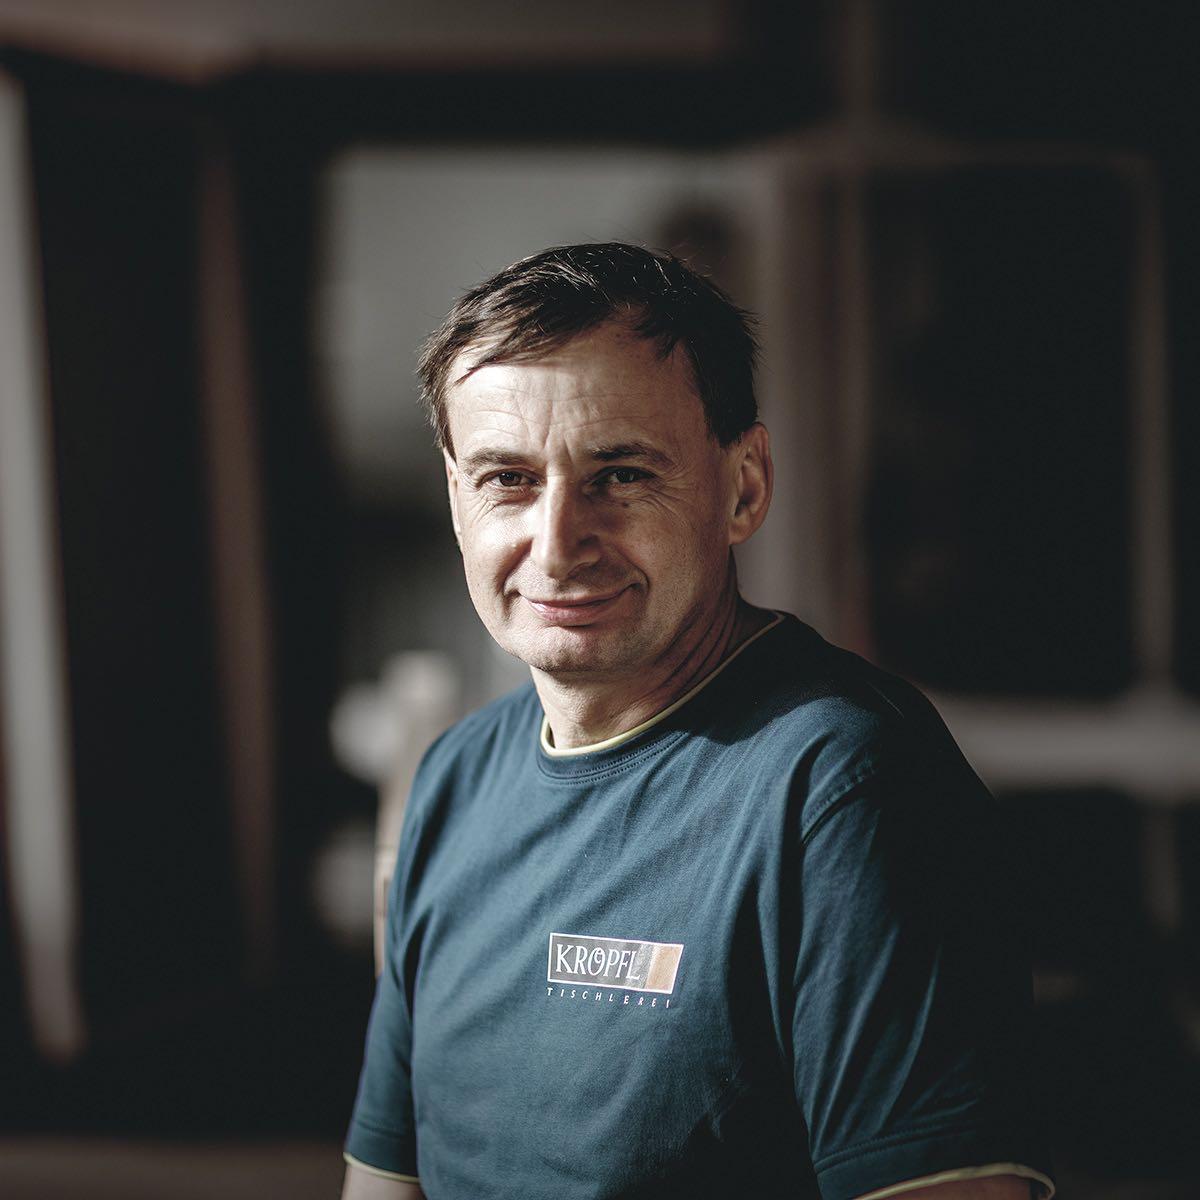 Karl Schirnhofer